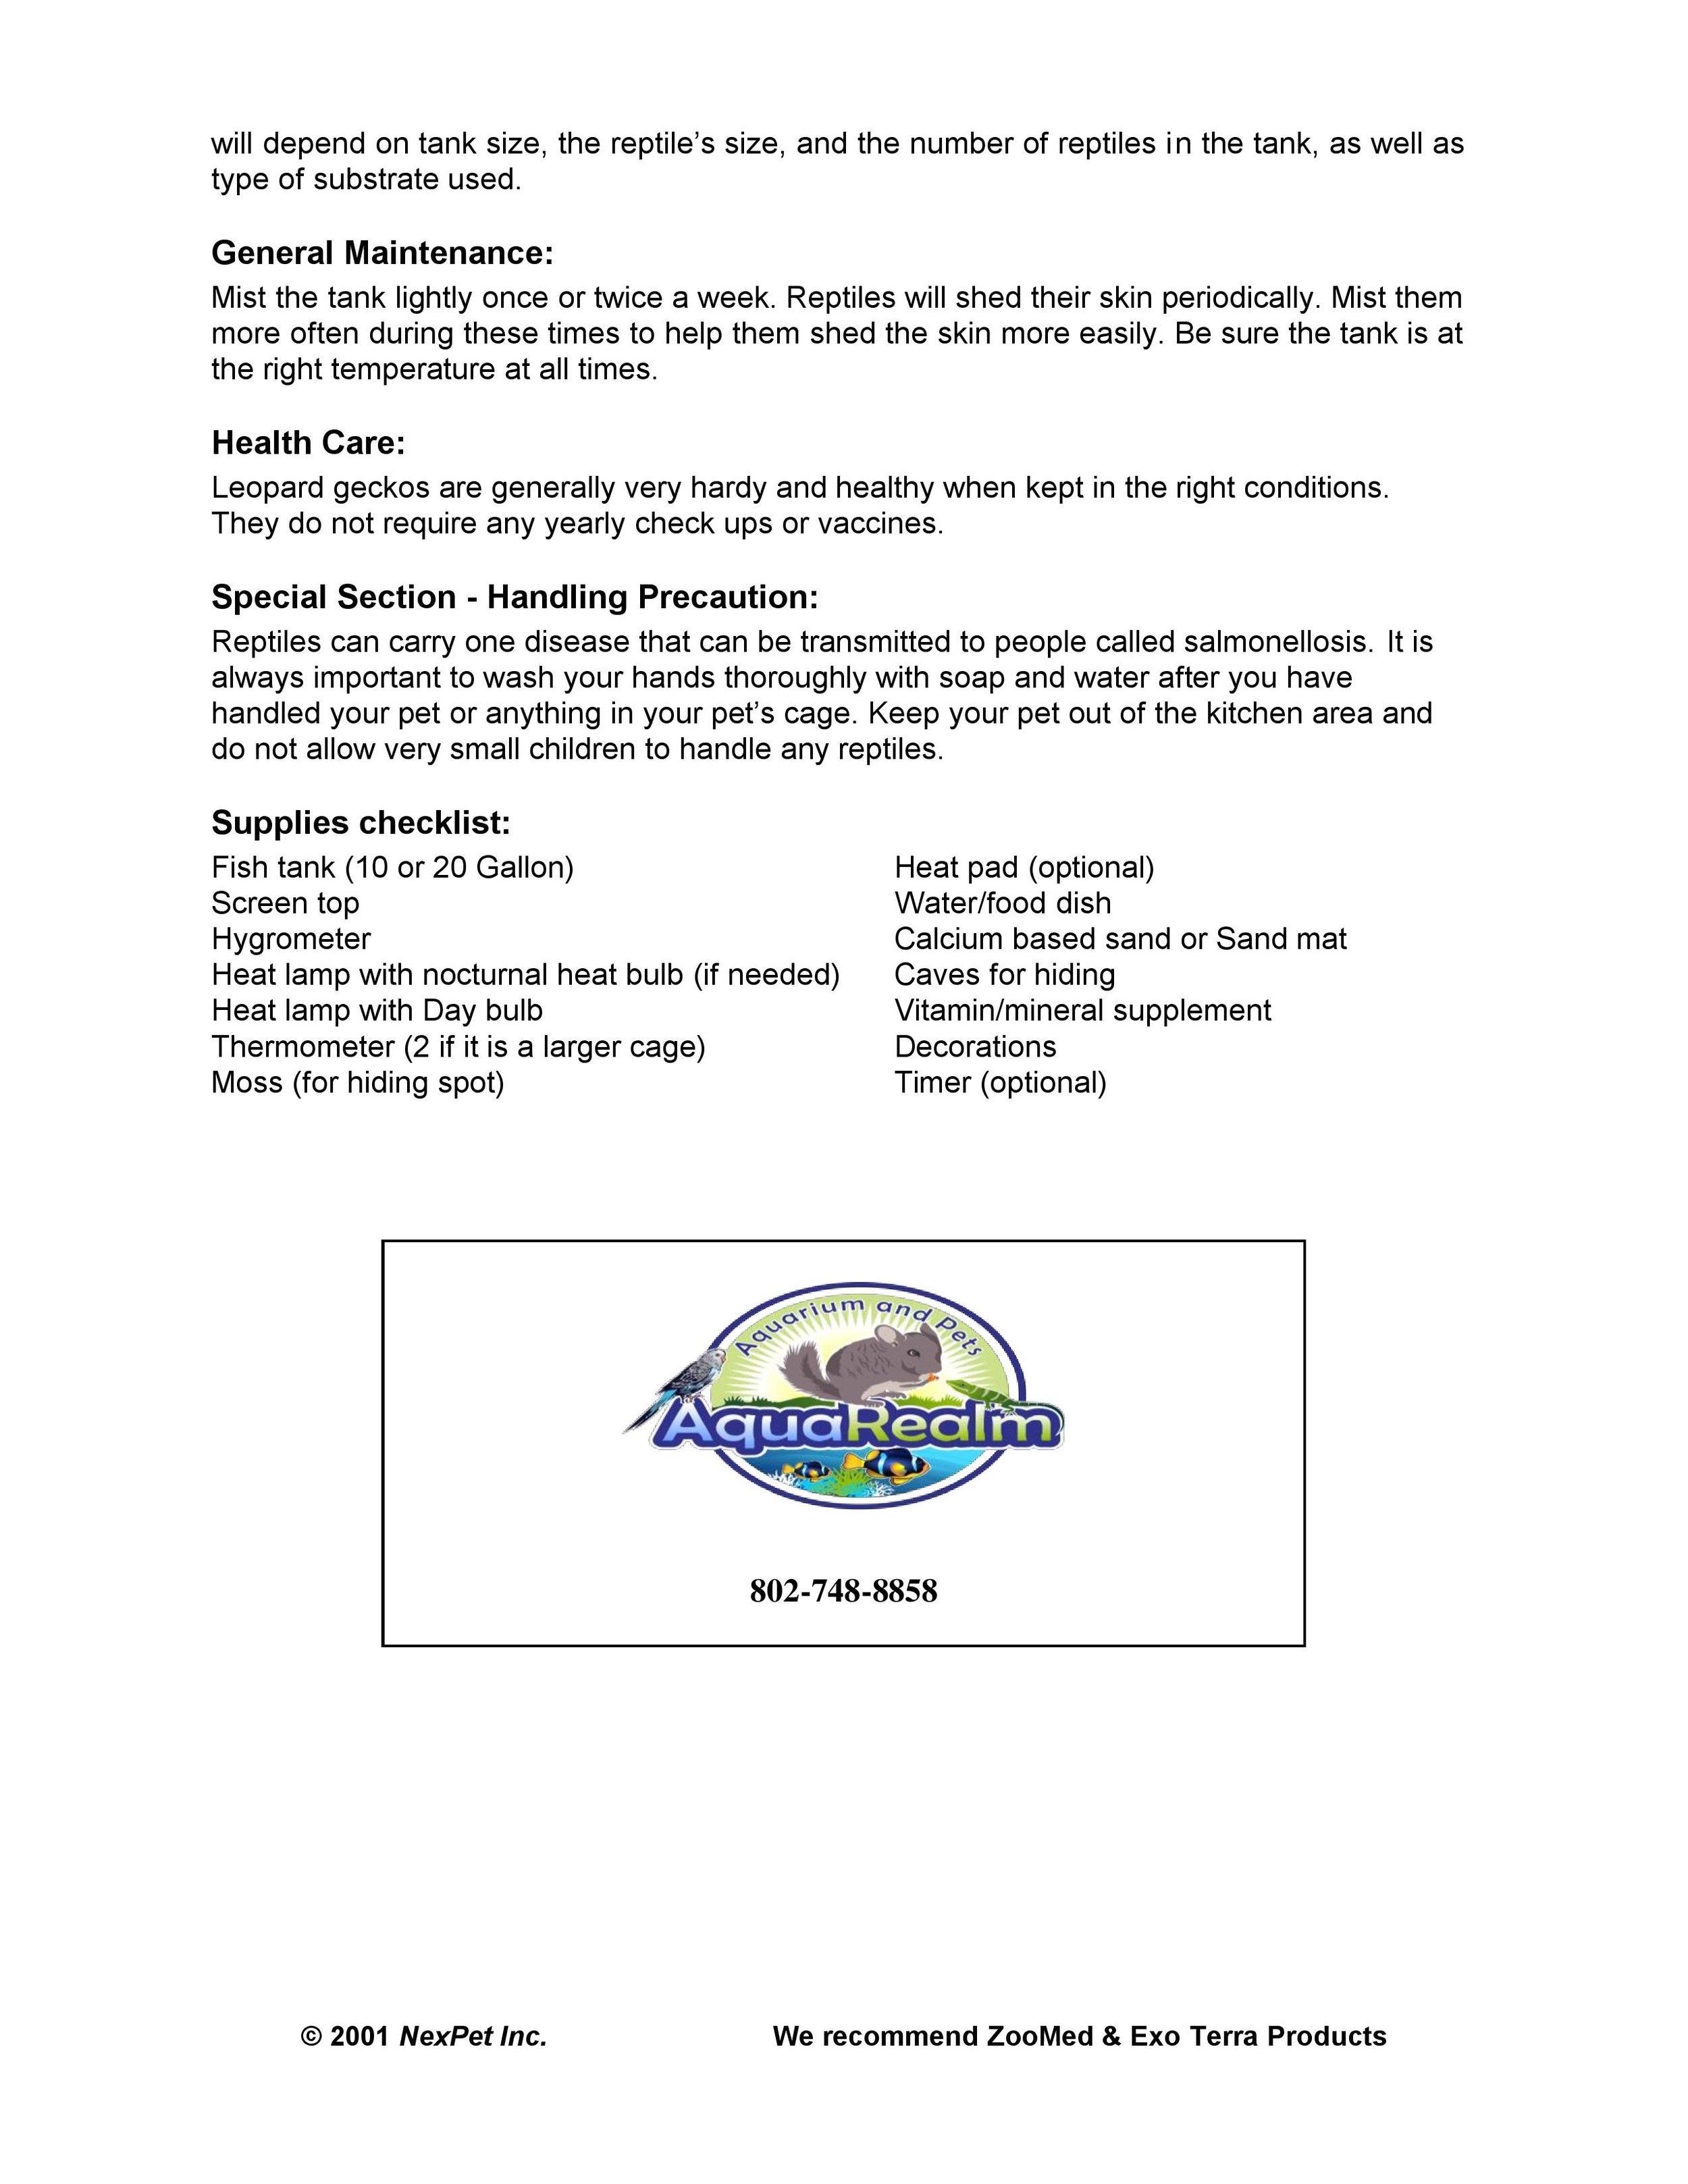 Leopard Gecko Care Sheet pg2